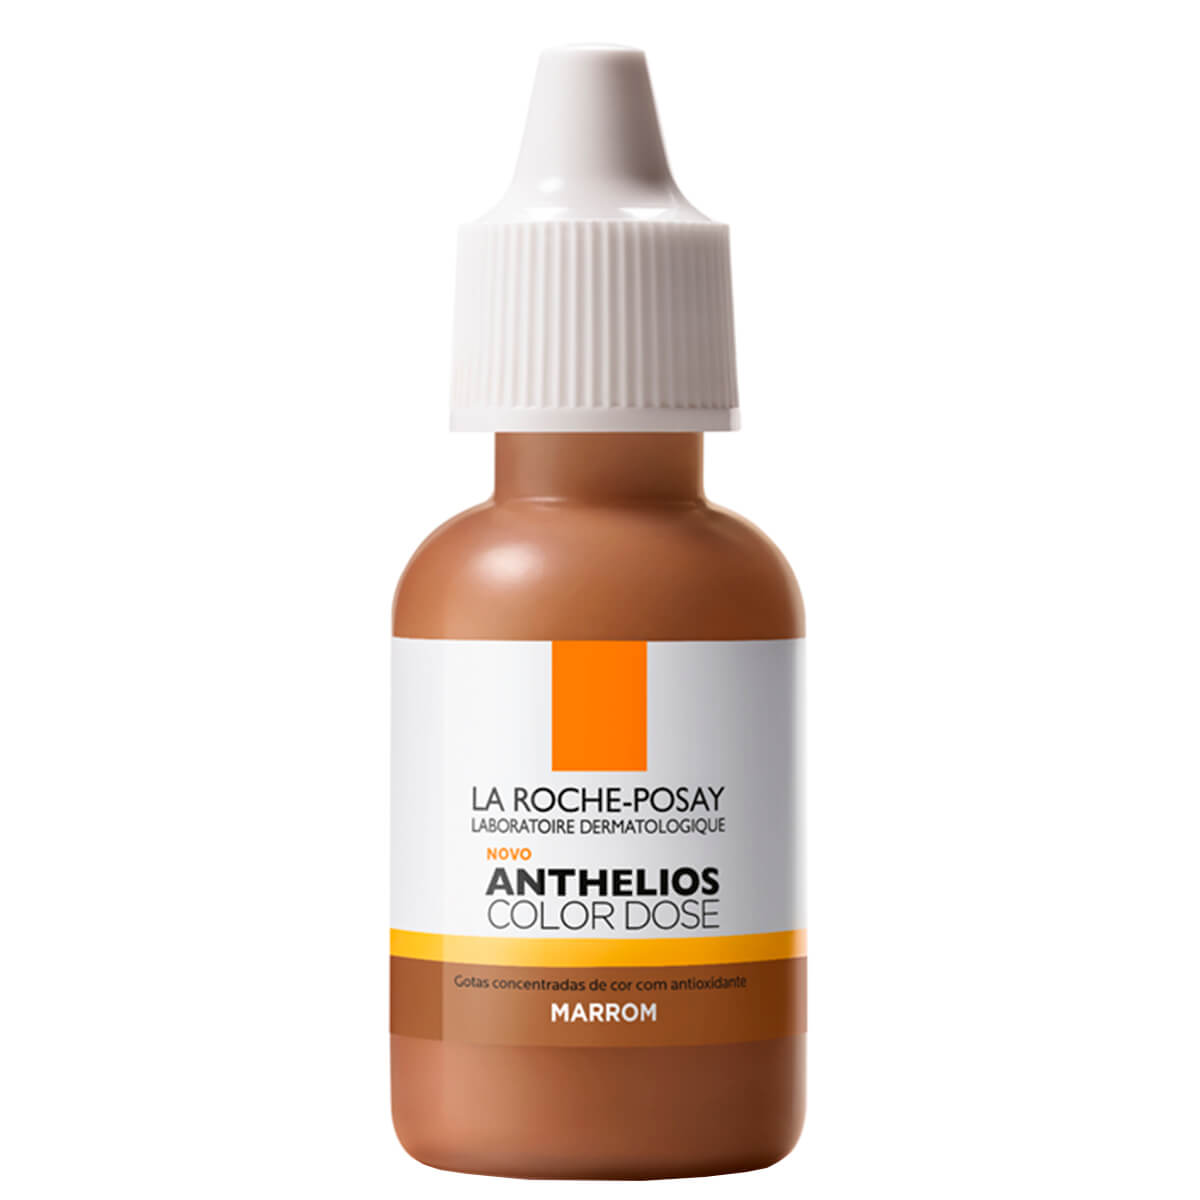 Pigmento Facial Anthelios Color Dose Marrom La Roche-Posay 17ml